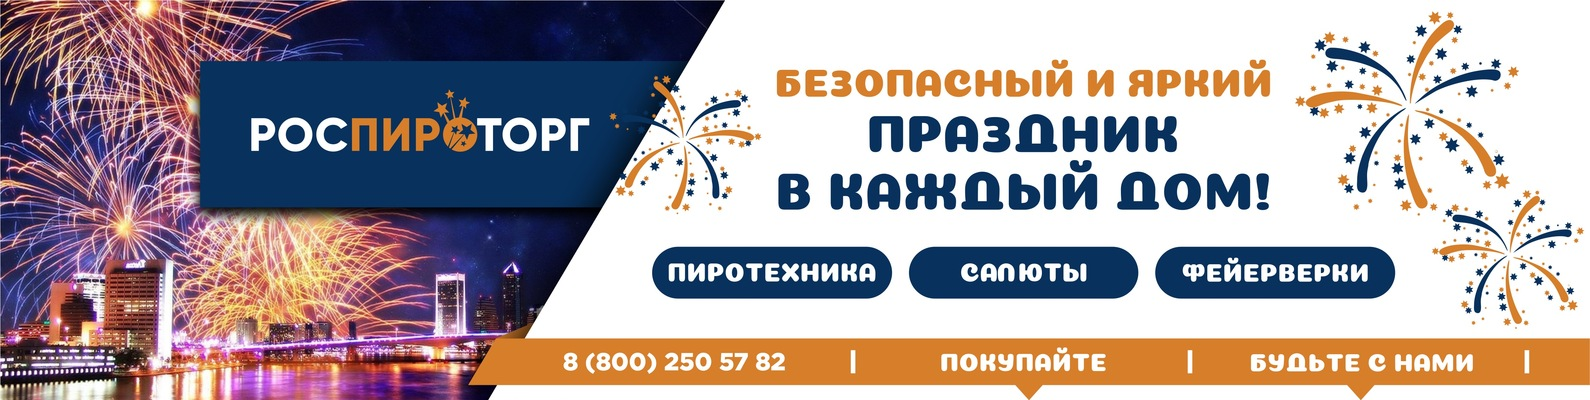 Фейерверки, салюты, пиротехника - опт и розница   ВКонтакте ade49cf8f88